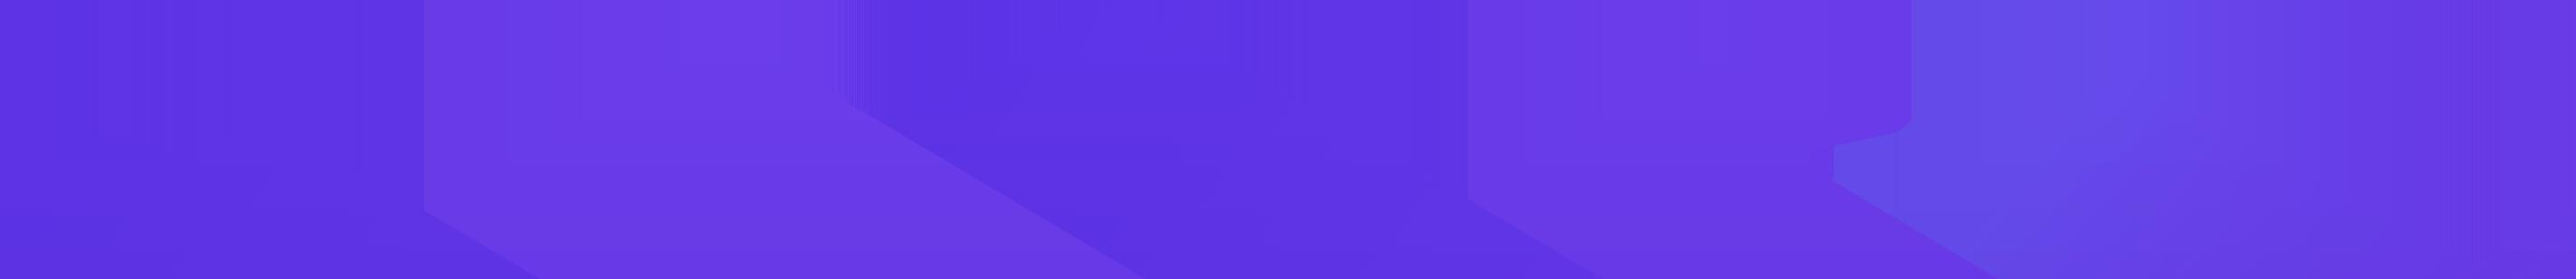 top-bg